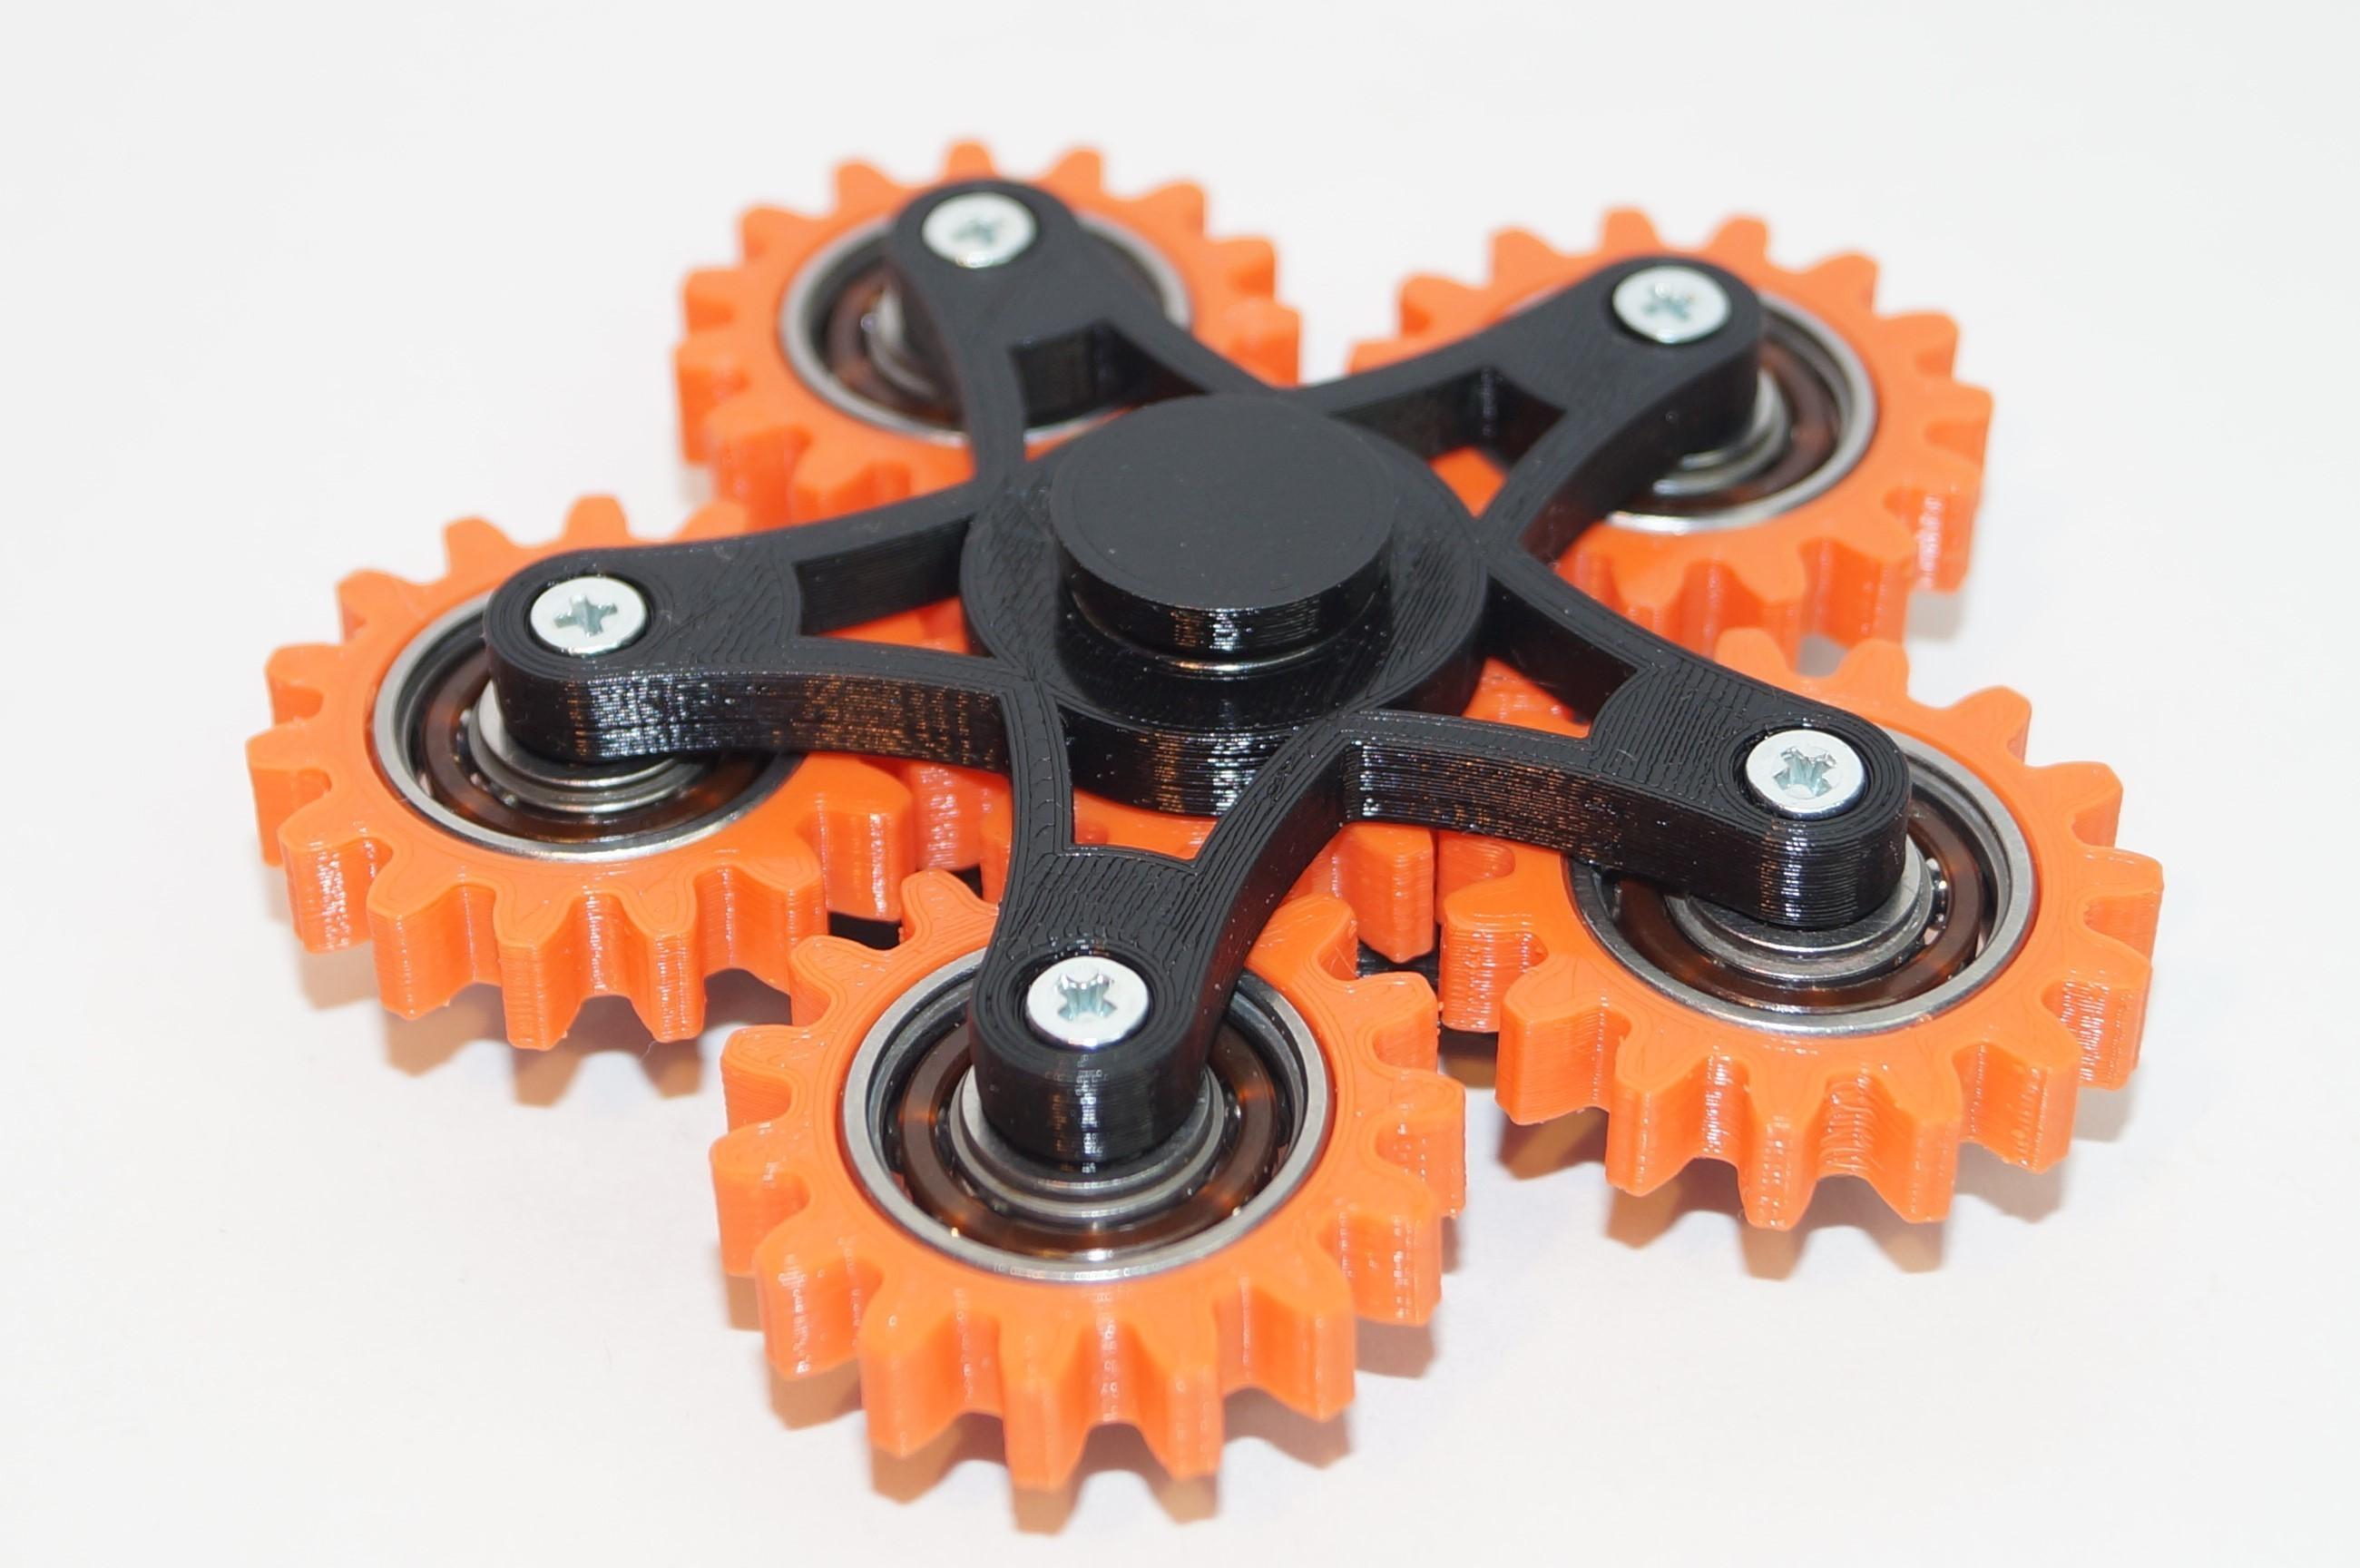 DSC06490.JPG Download free STL file New hand spinner six gears • Template to 3D print, Vladimir310873